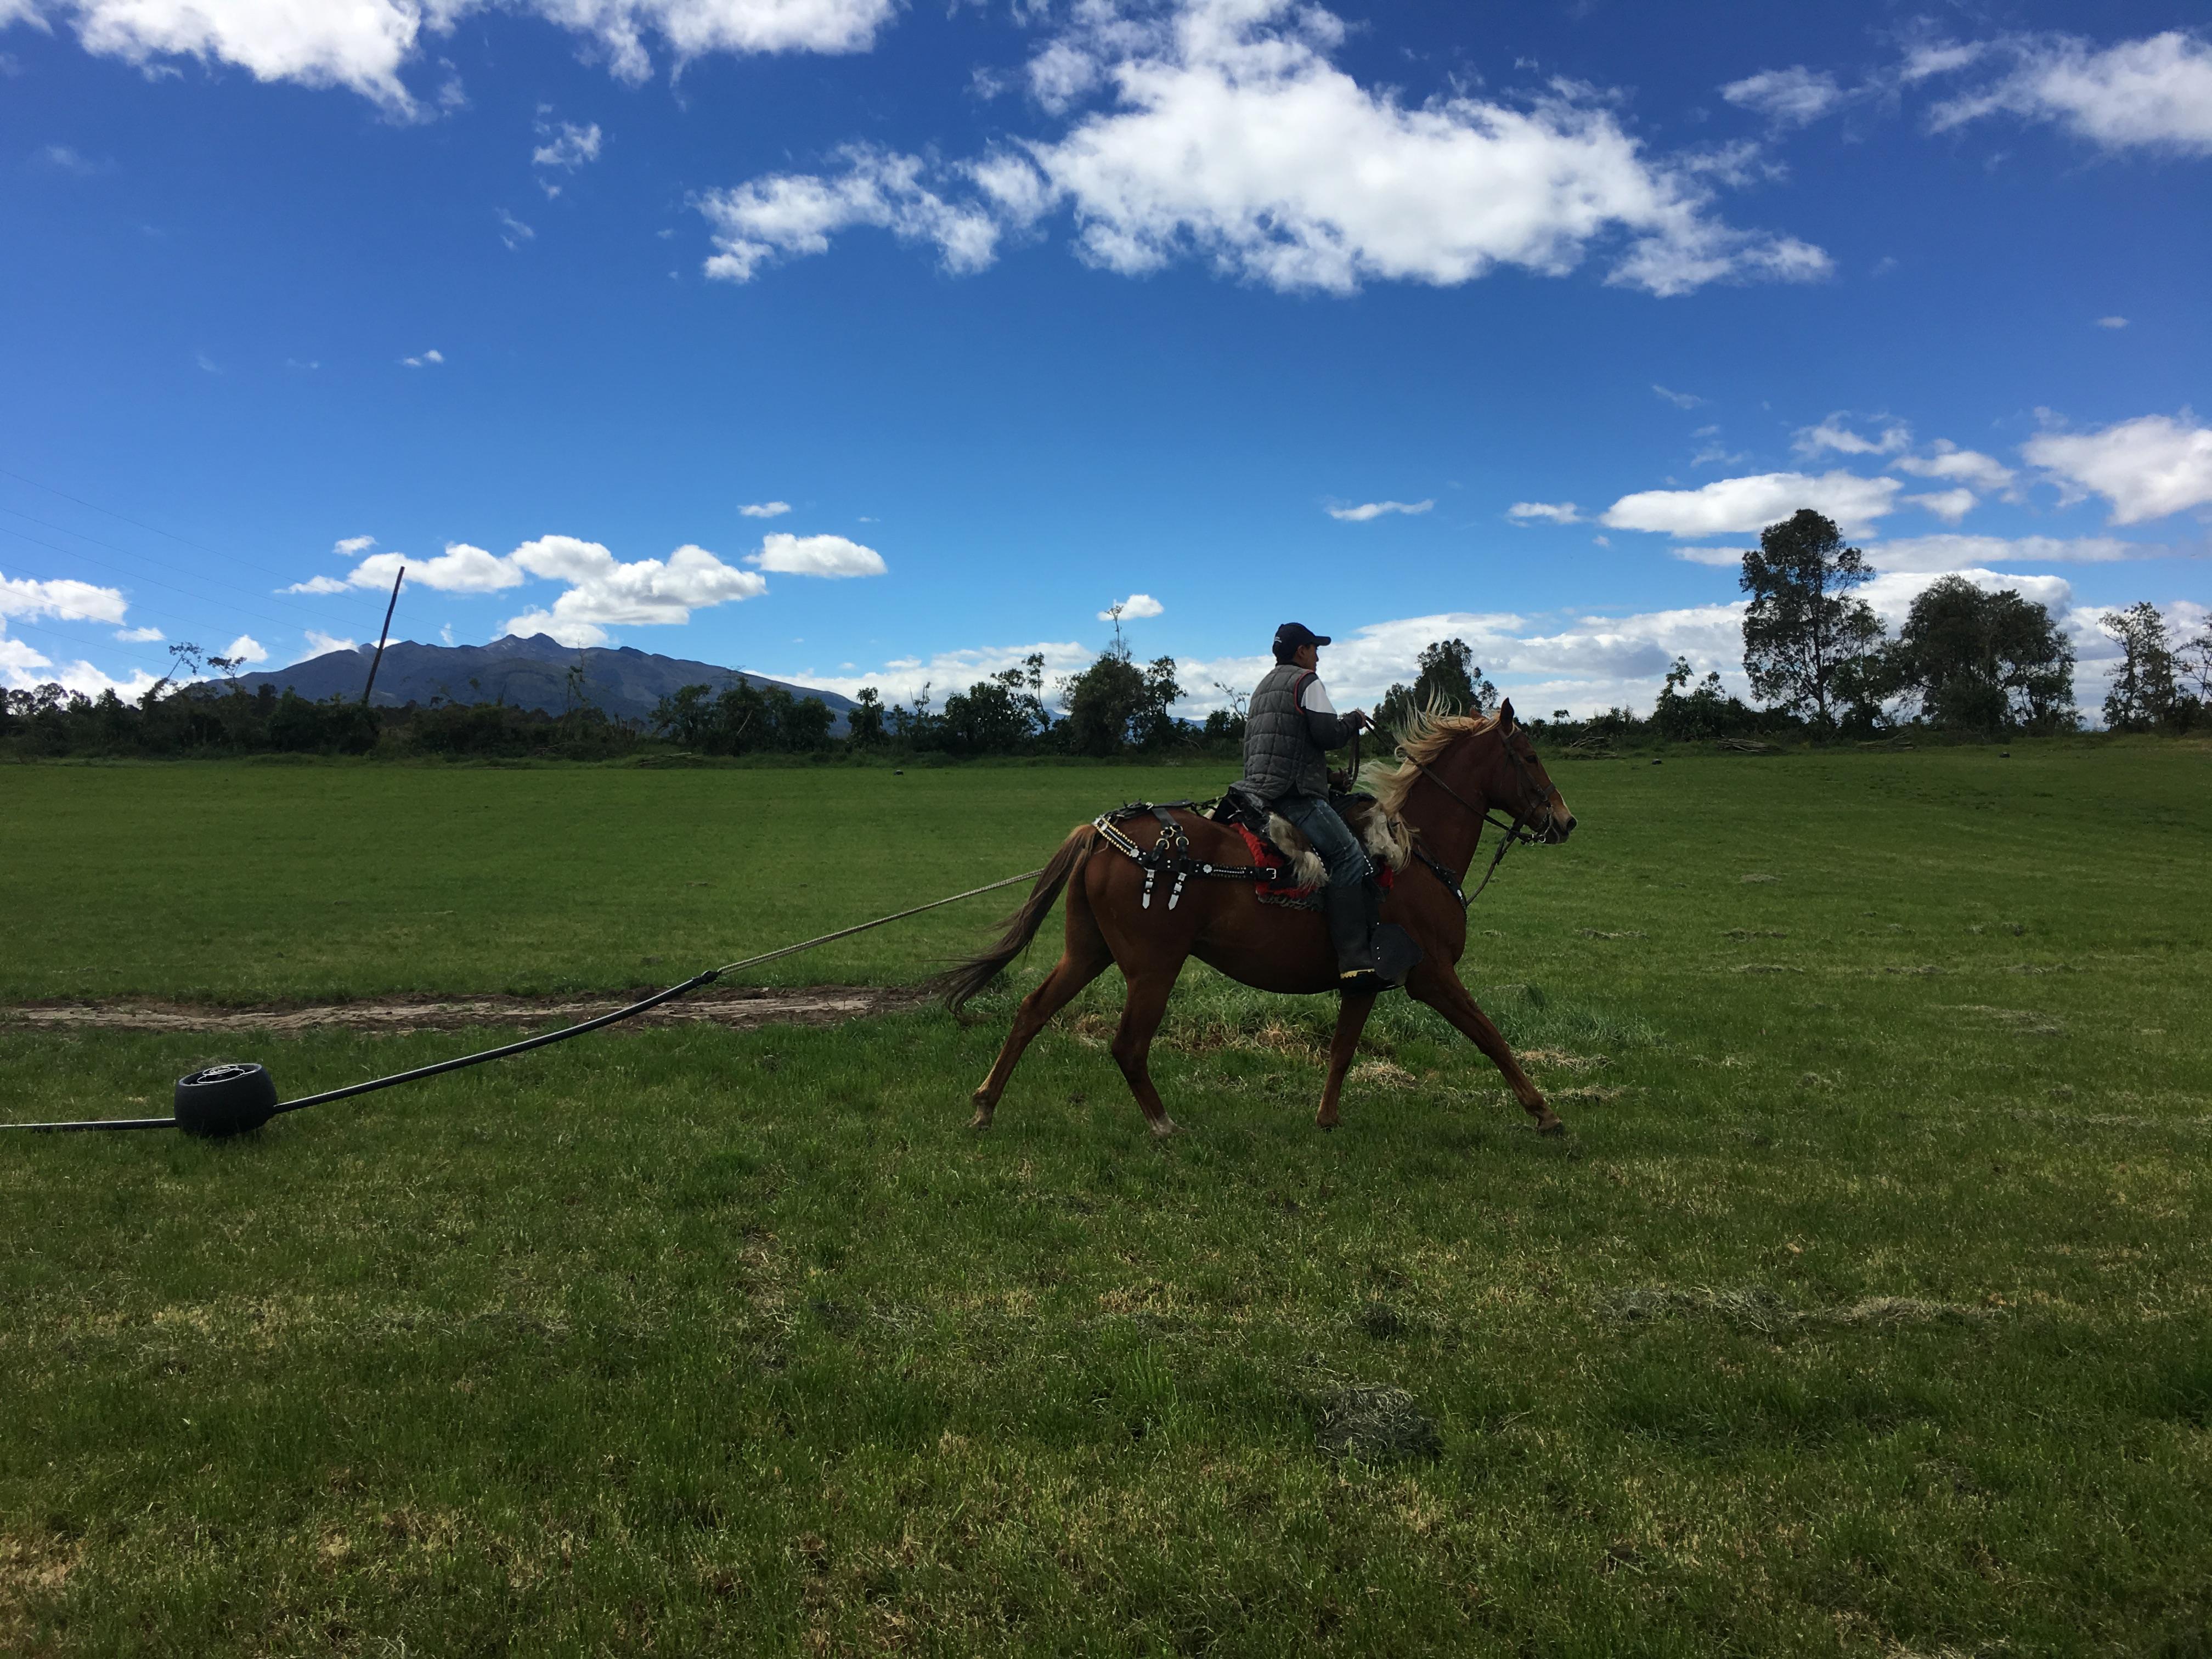 Sistema de riego móvil para pasturas K-Line jalado por un caballo en Machachi Ecuador.